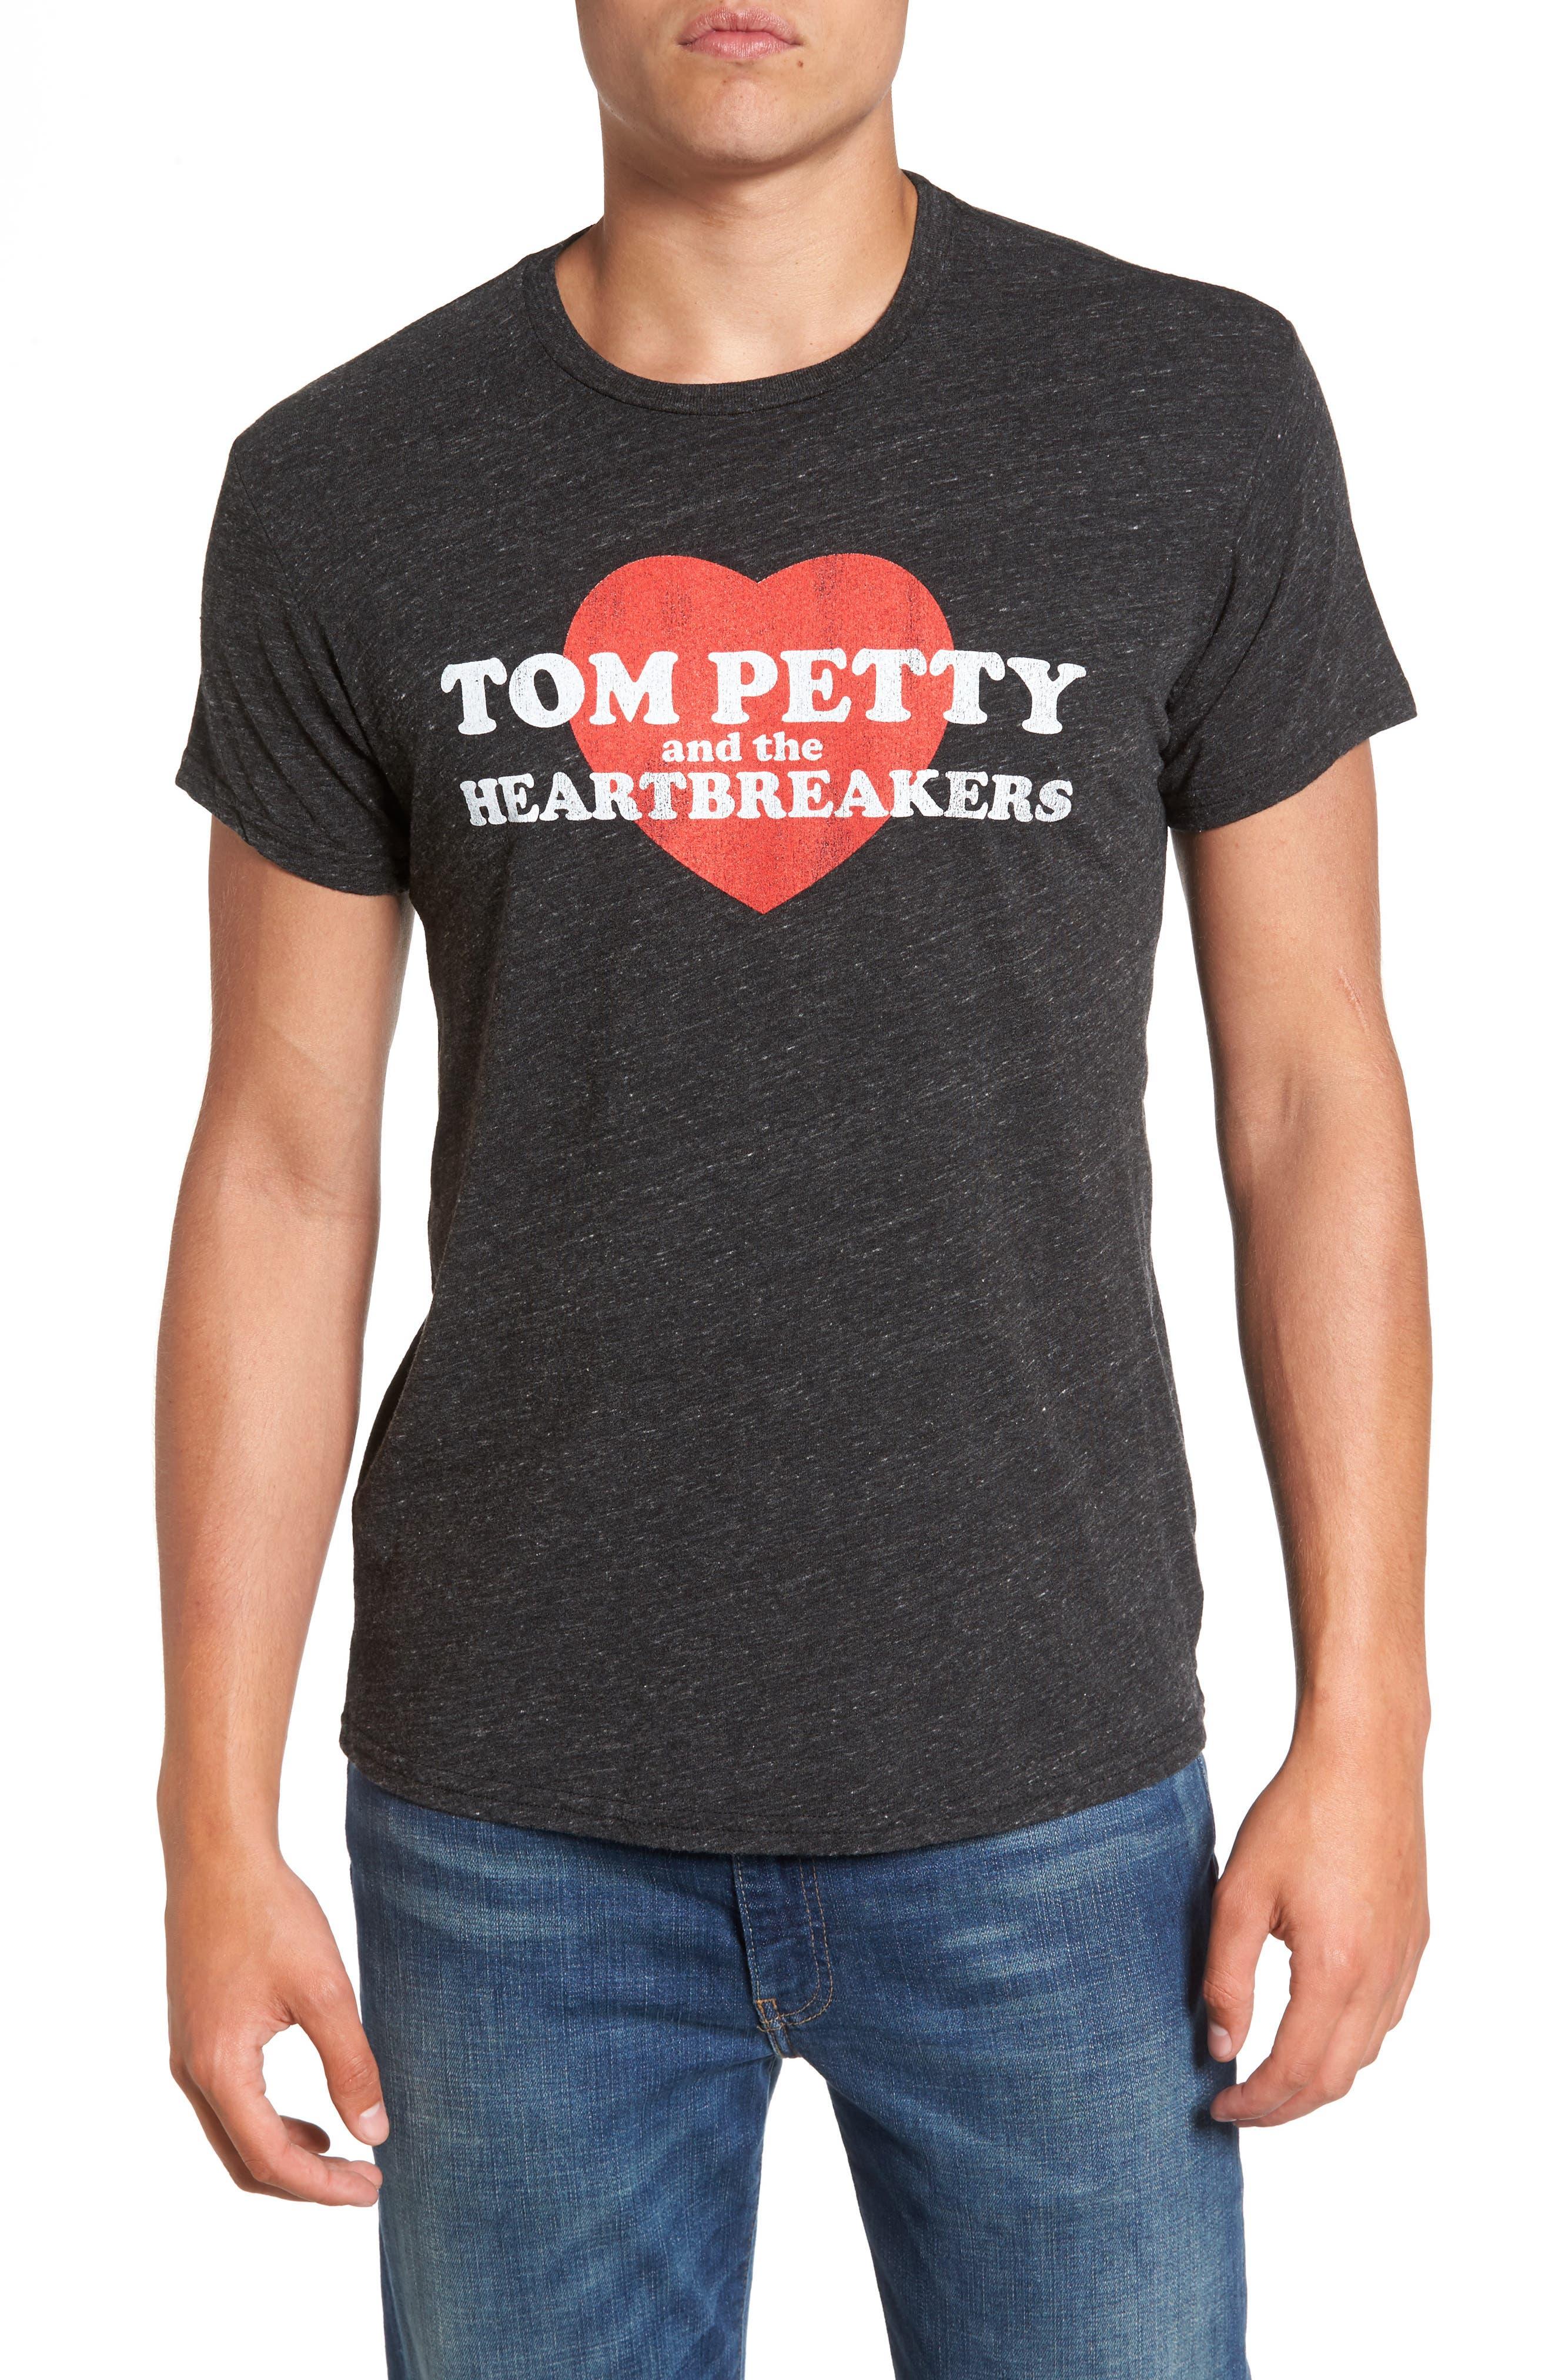 Retro Brand Tom Petty Graphic T-Shirt